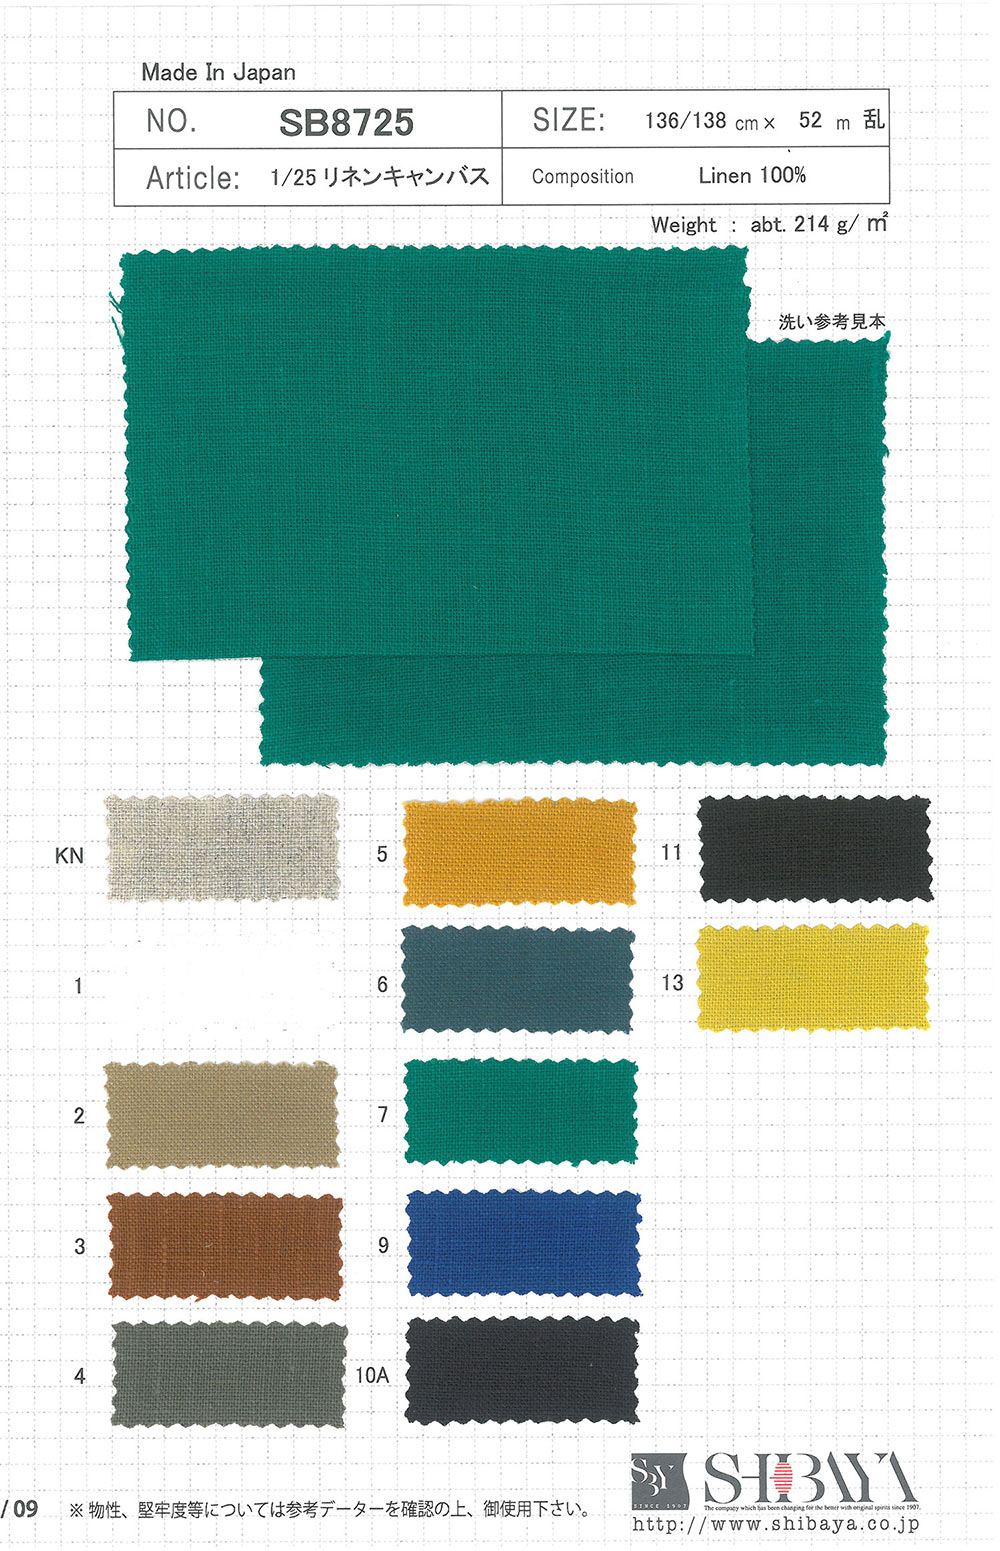 SB8725 1/25リネンキャンバス[生地] 柴屋/オークラ商事 - ApparelX アパレル資材卸通販